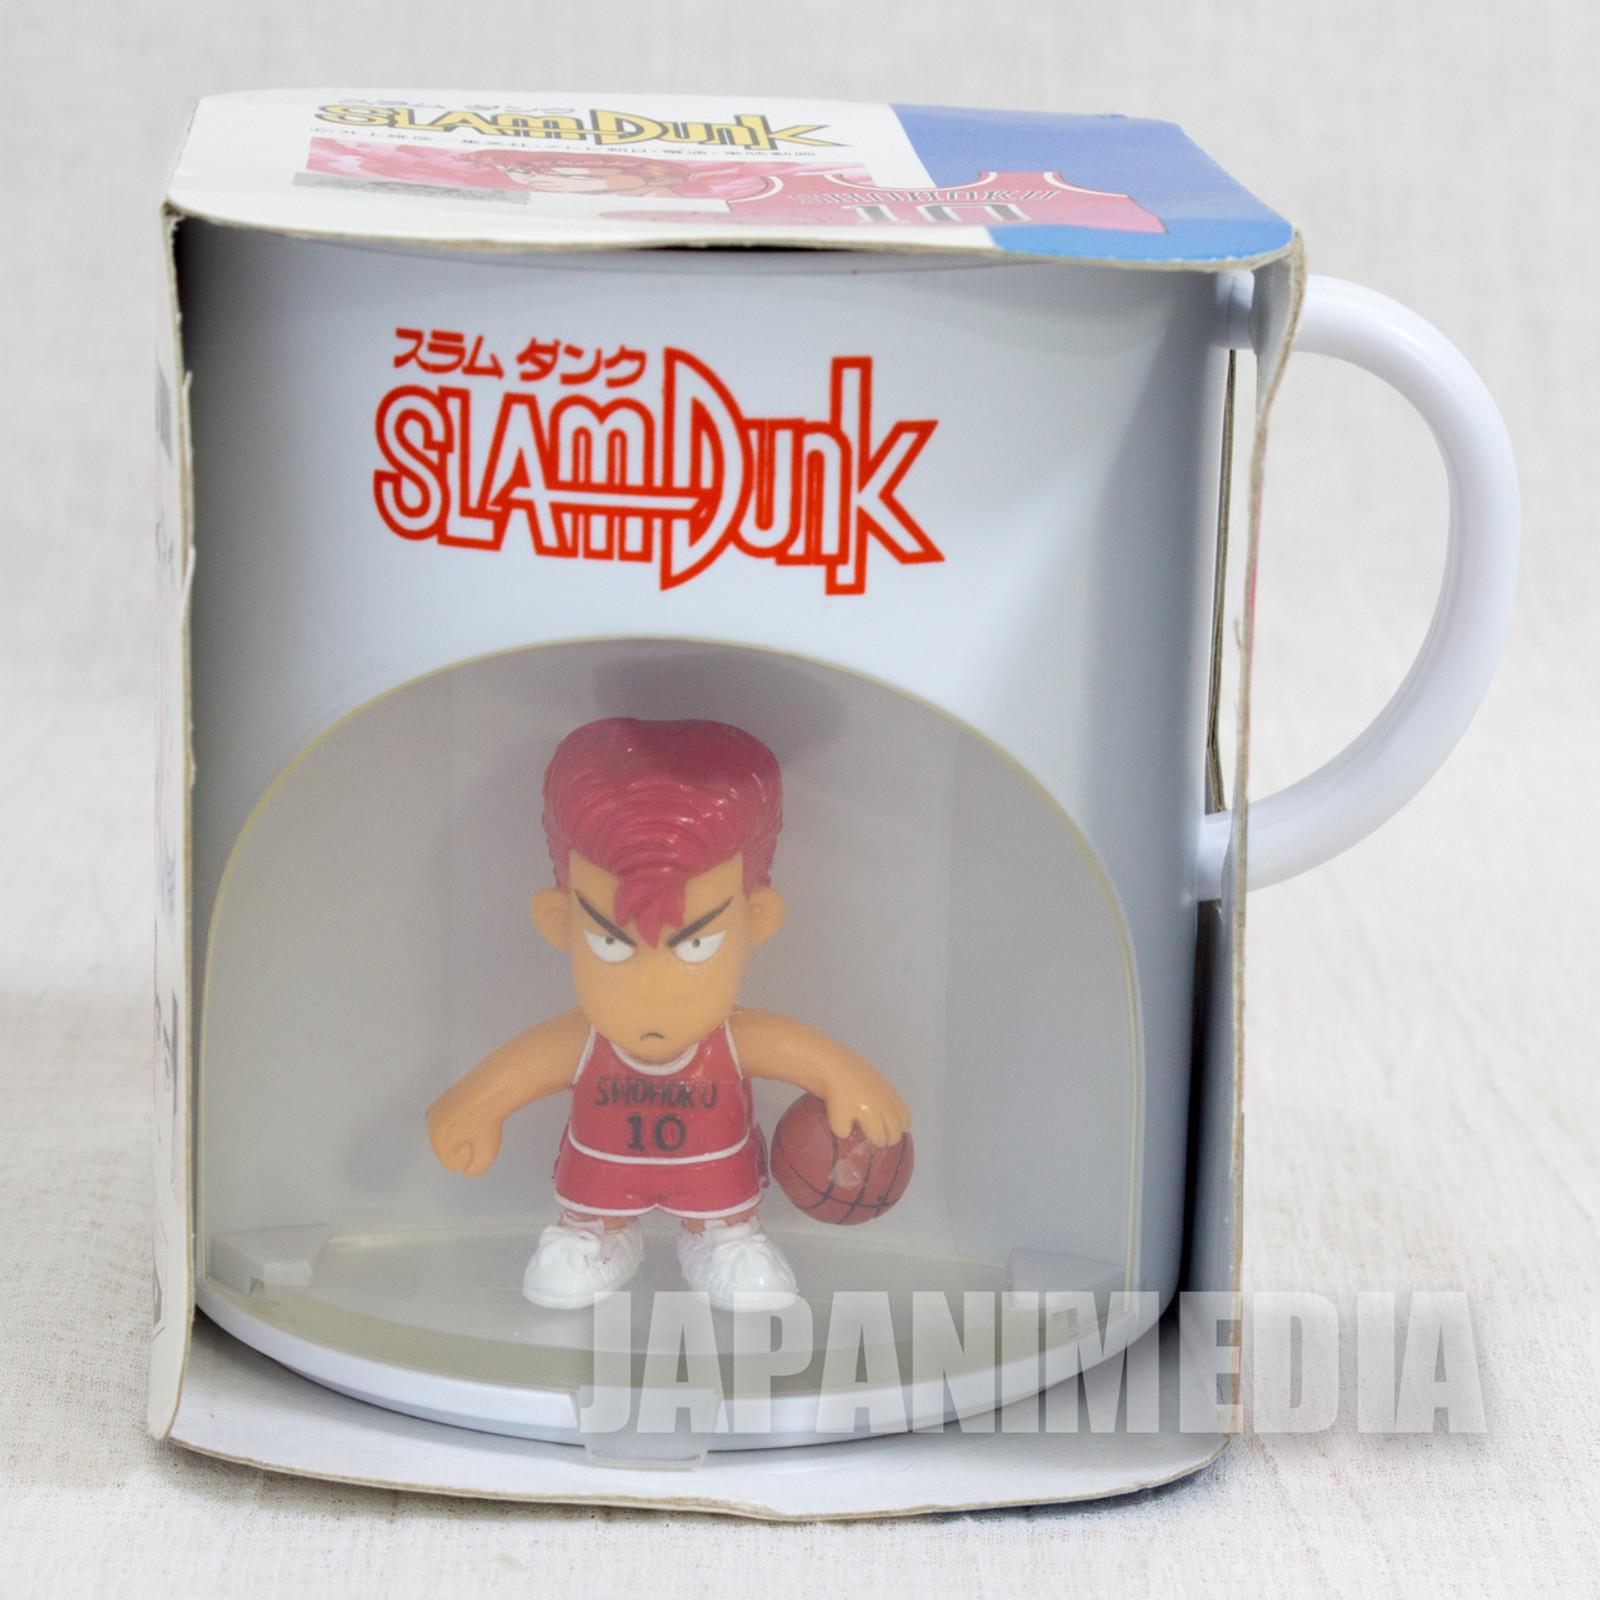 SLAM DUNK Hanamichi Sakuragi Team Shohoku #10 Figure in Plastic Mug Banpresto JAPAN ANIME MANGA